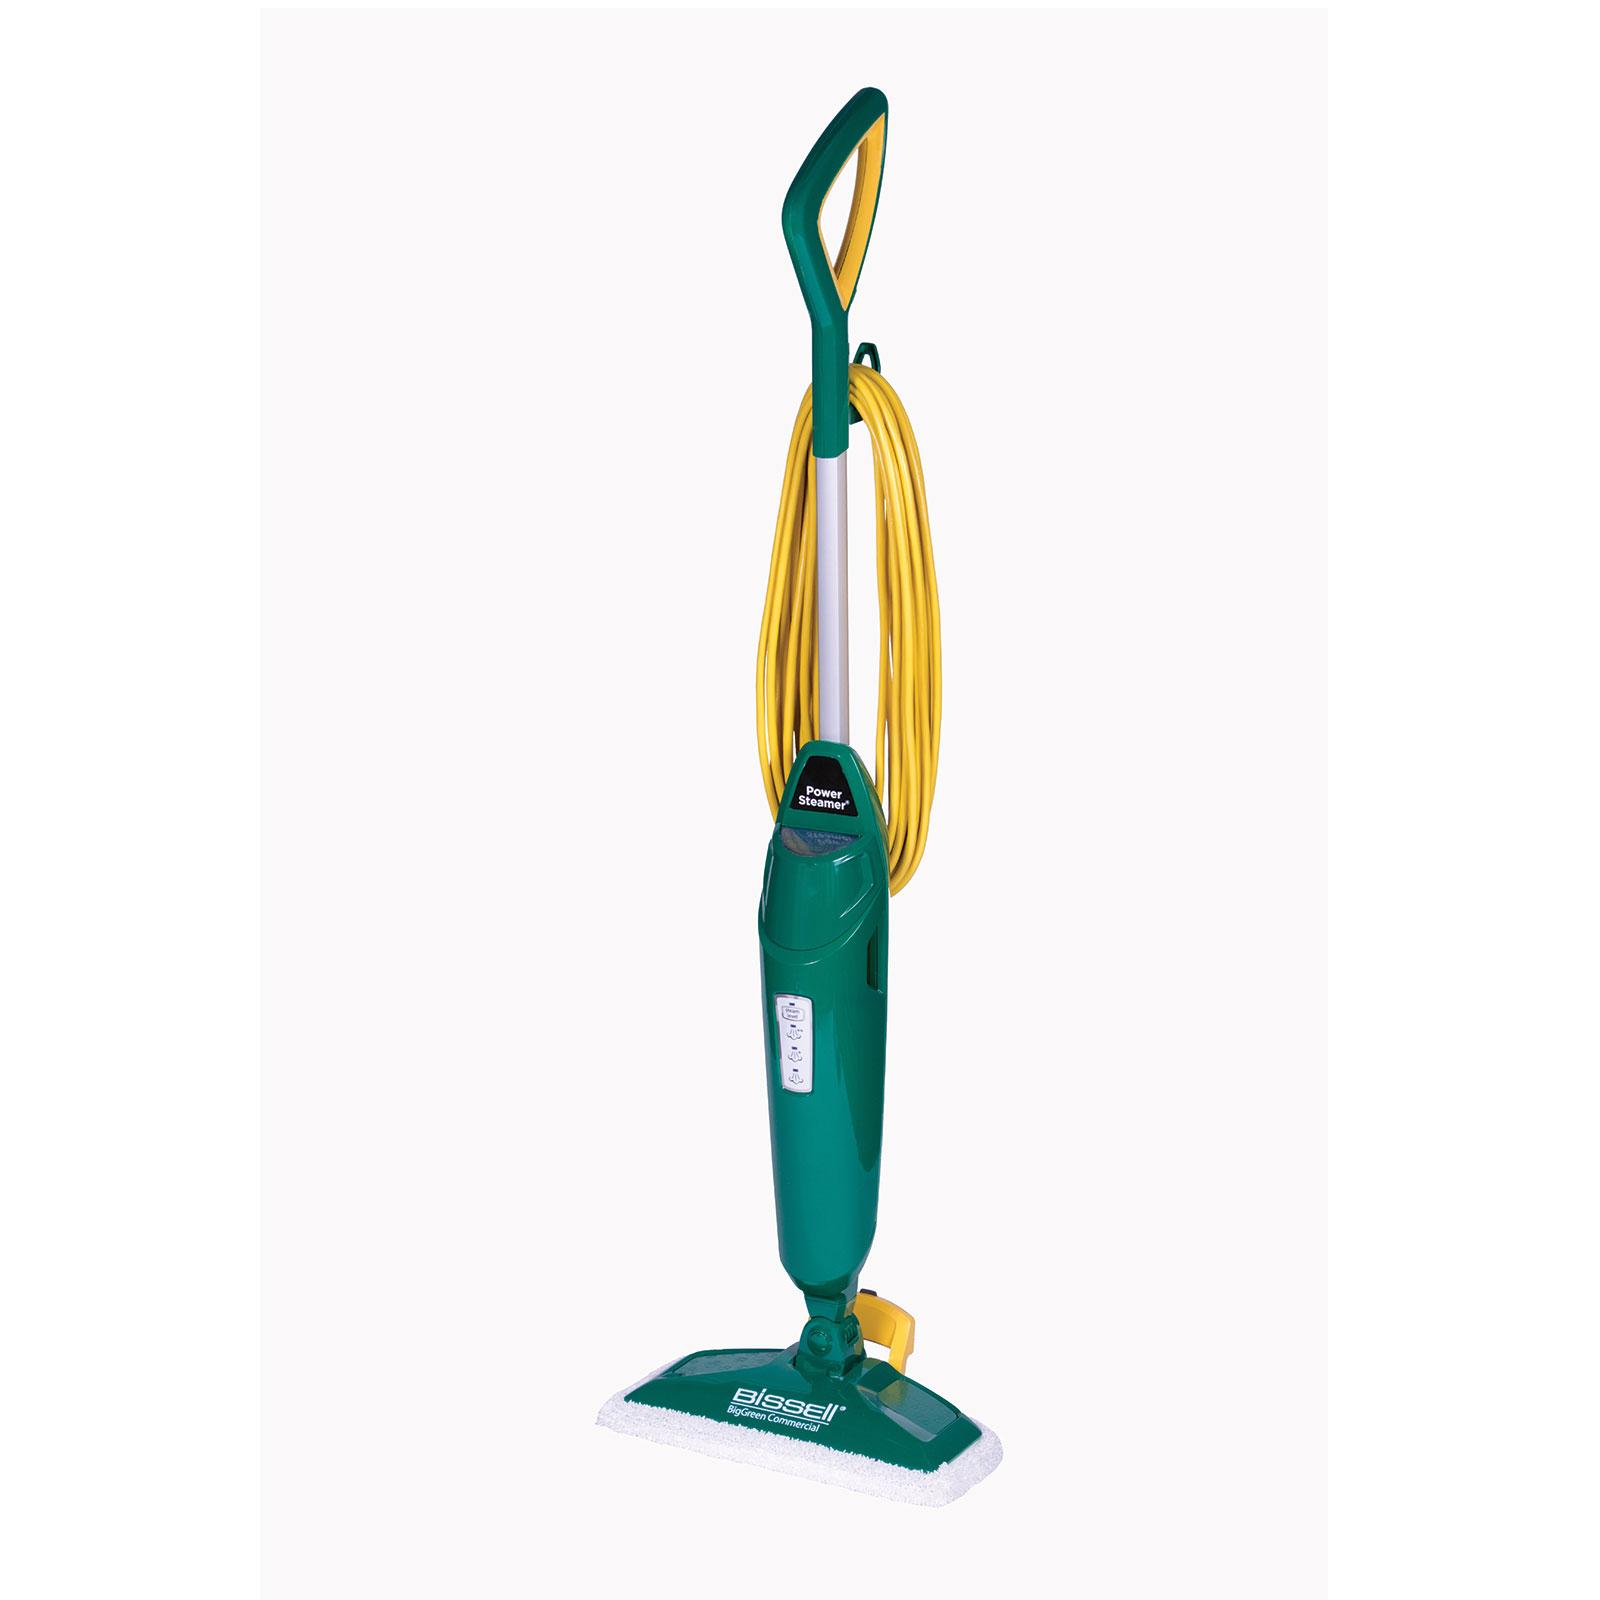 Bissell Big Green Commercial BGST1566 wet mop, complete